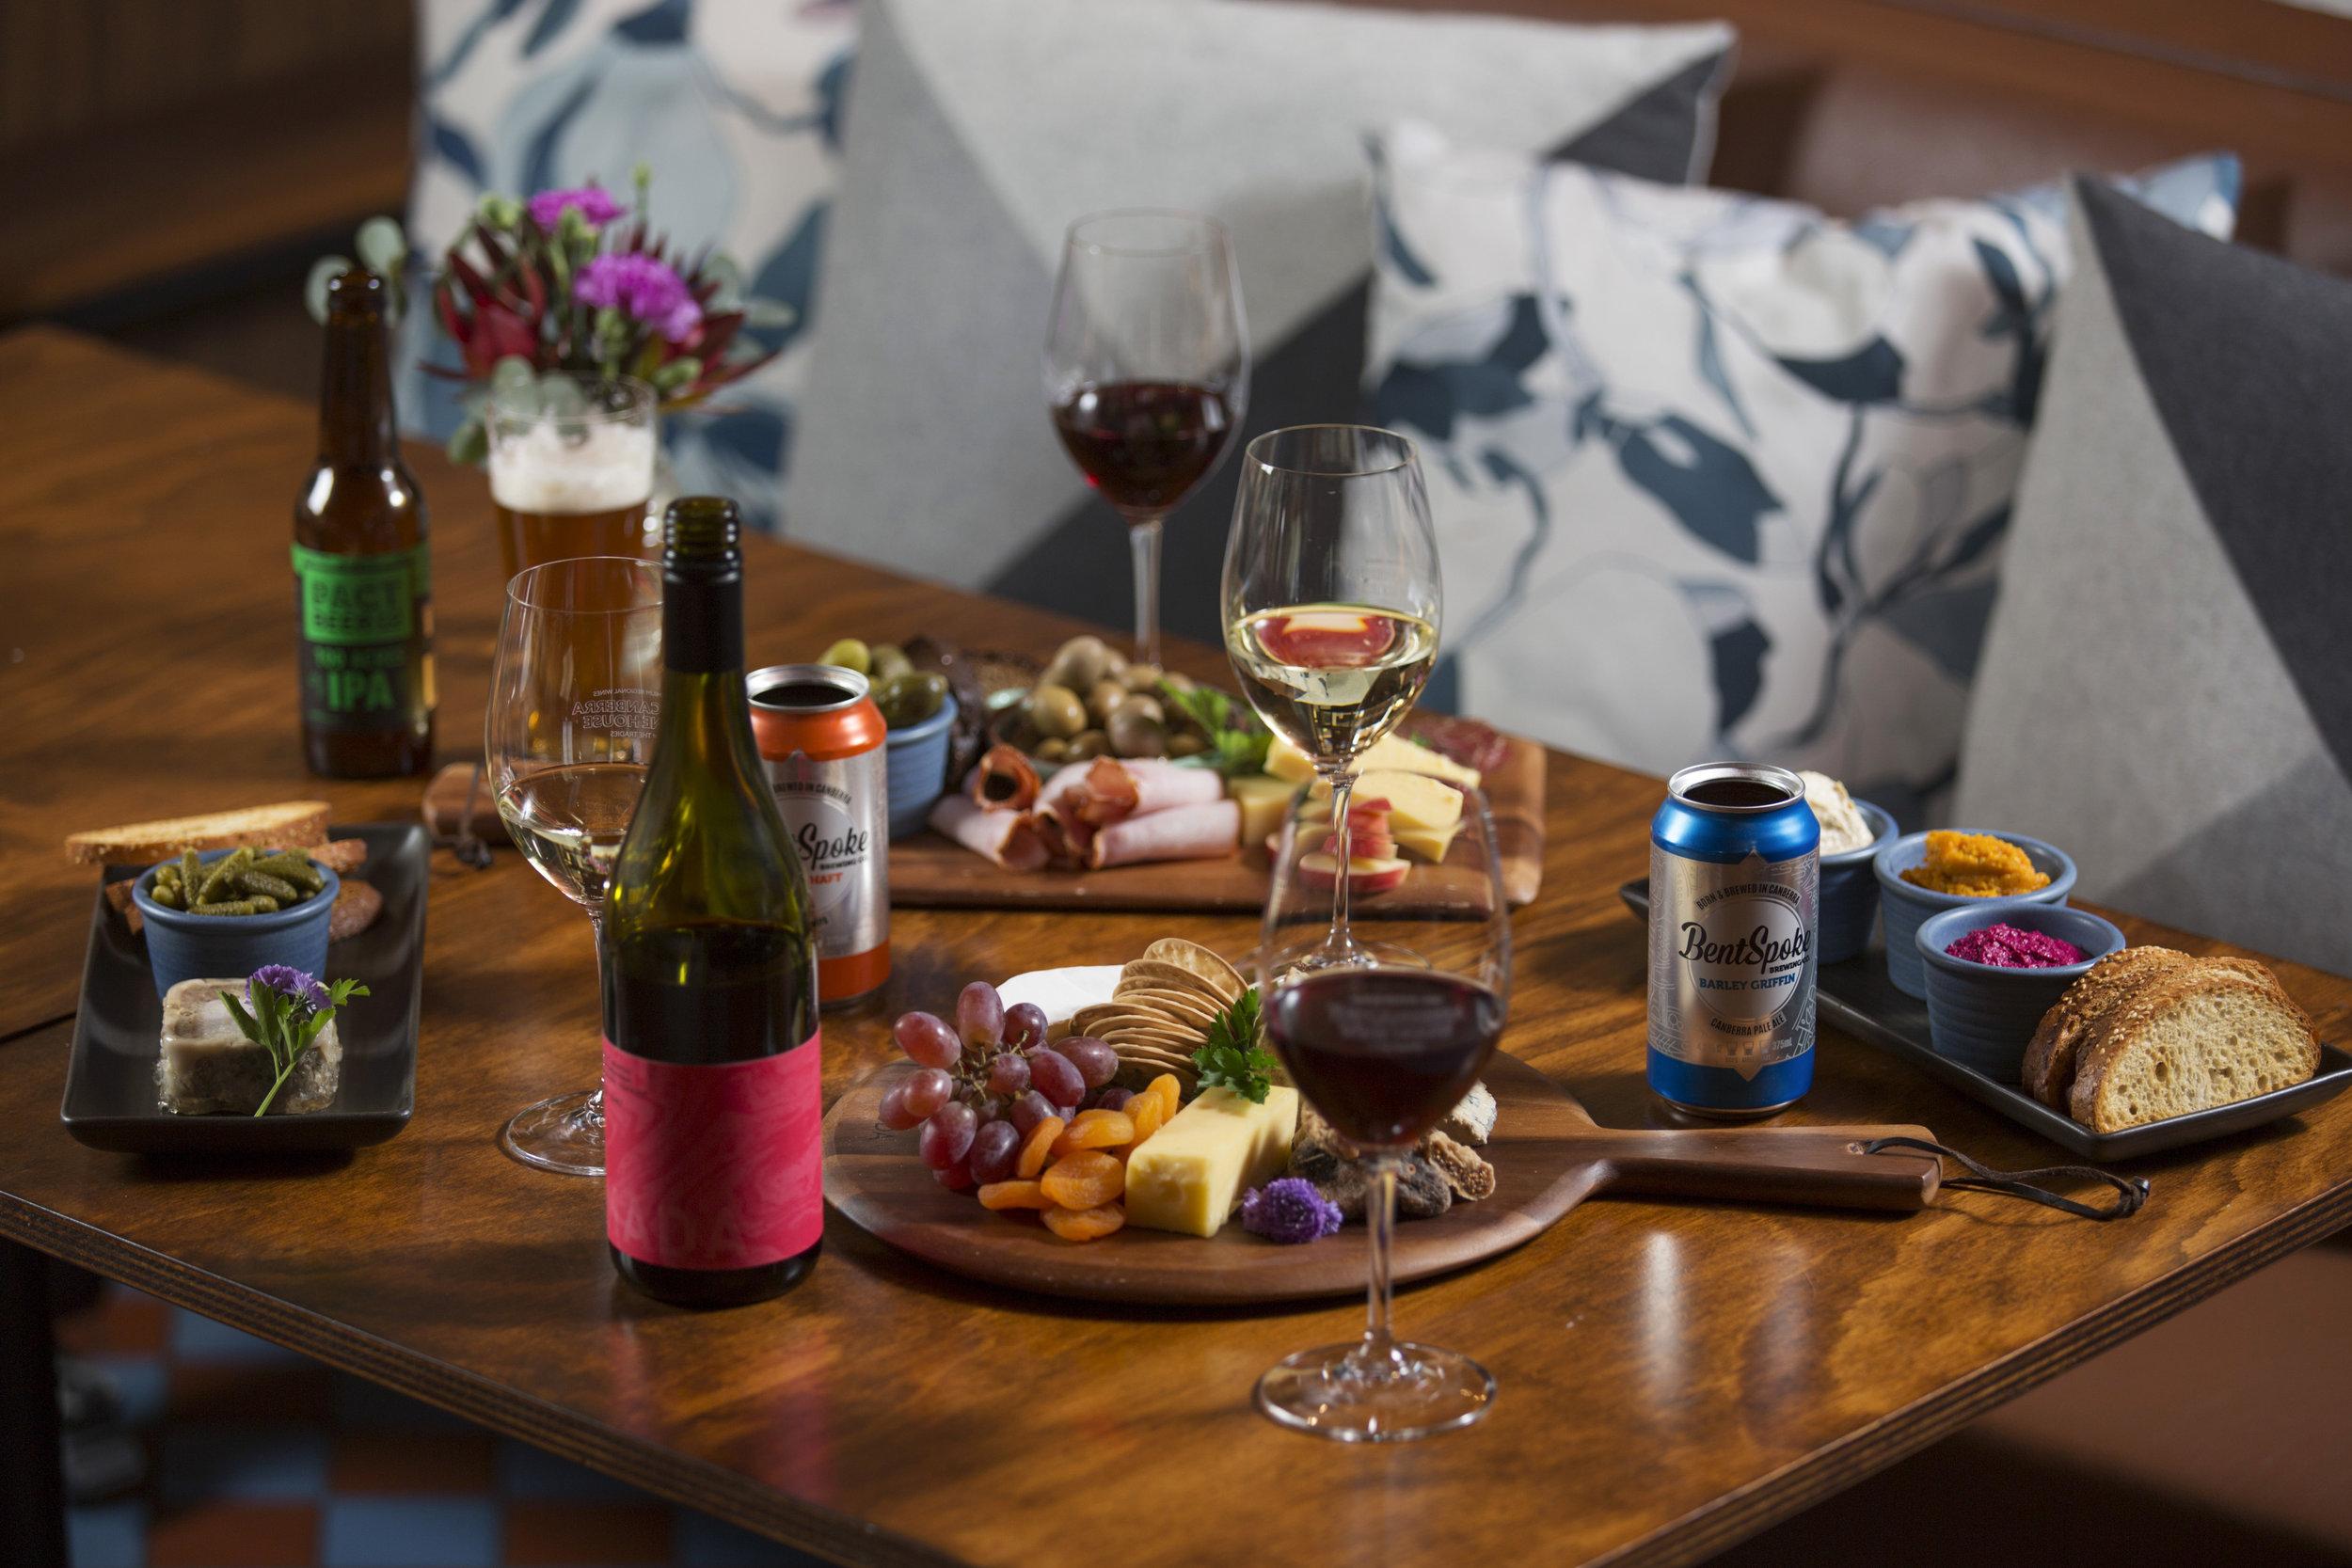 [171012-171012] The Canberra Wine House (Sean Davey) _0024 [Original].jpg